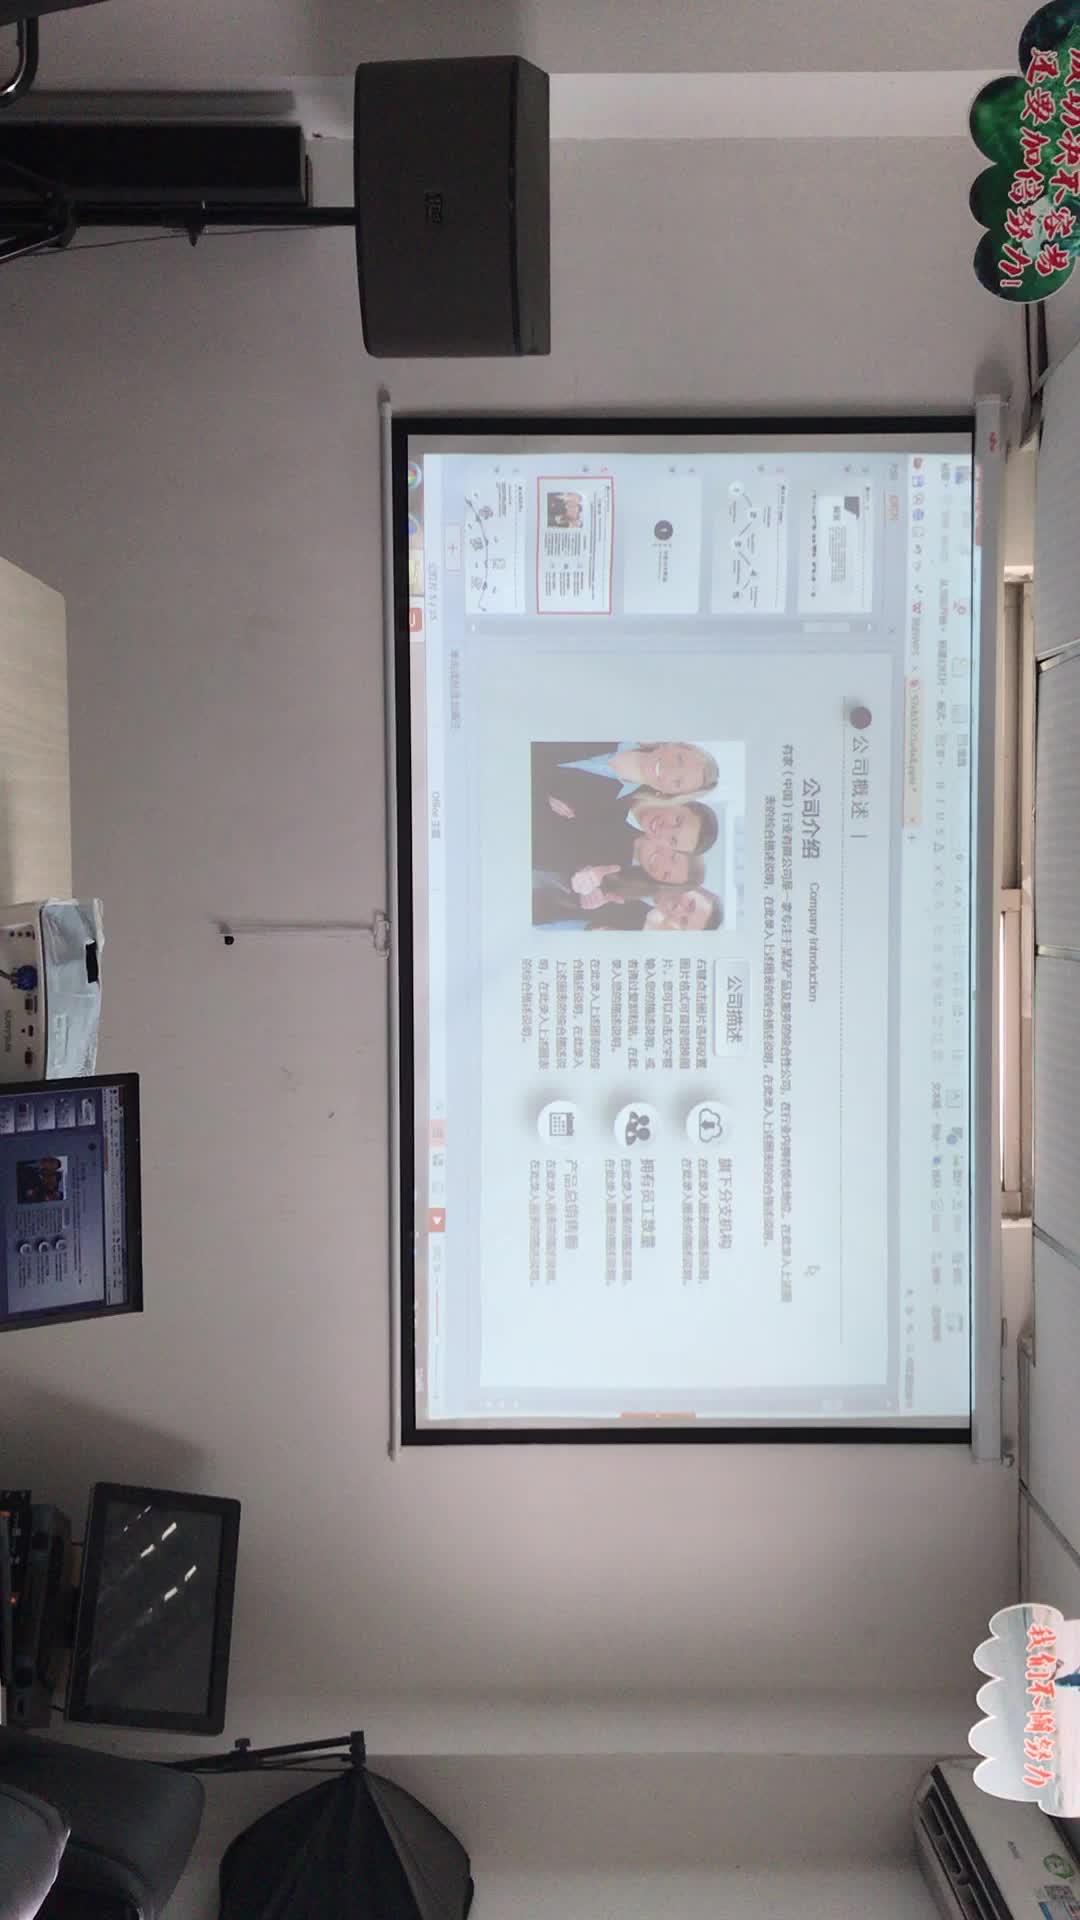 Business & Education & Home Use 4000 Ansi Lumens 240 W Osram Lâmpada High End XGA DLP Projetor de Curto Alcance